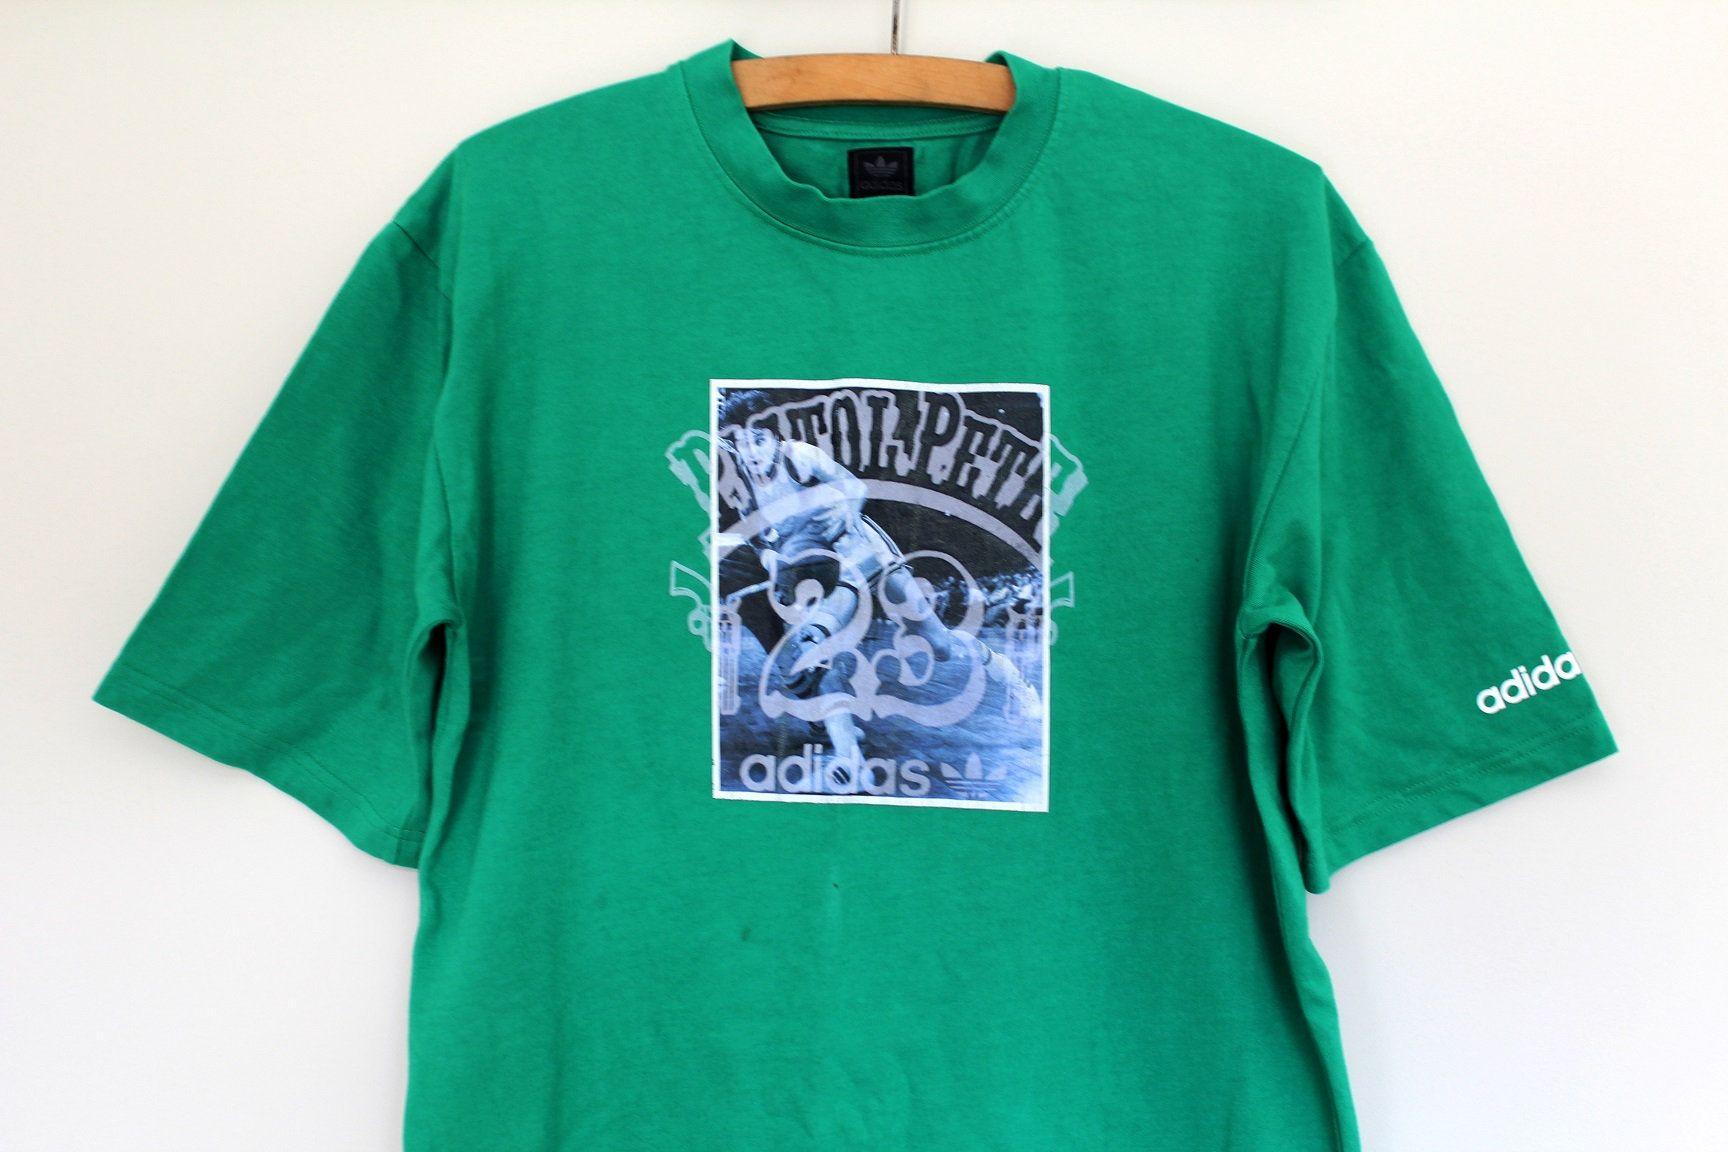 Vintage Trefoil Adidas Shirt Green T Shirt Hip Hop Dance Etsy Adidas Shirt Adidas Sweatshirt Sweatshirt Short Sleeve [ 1152 x 1728 Pixel ]